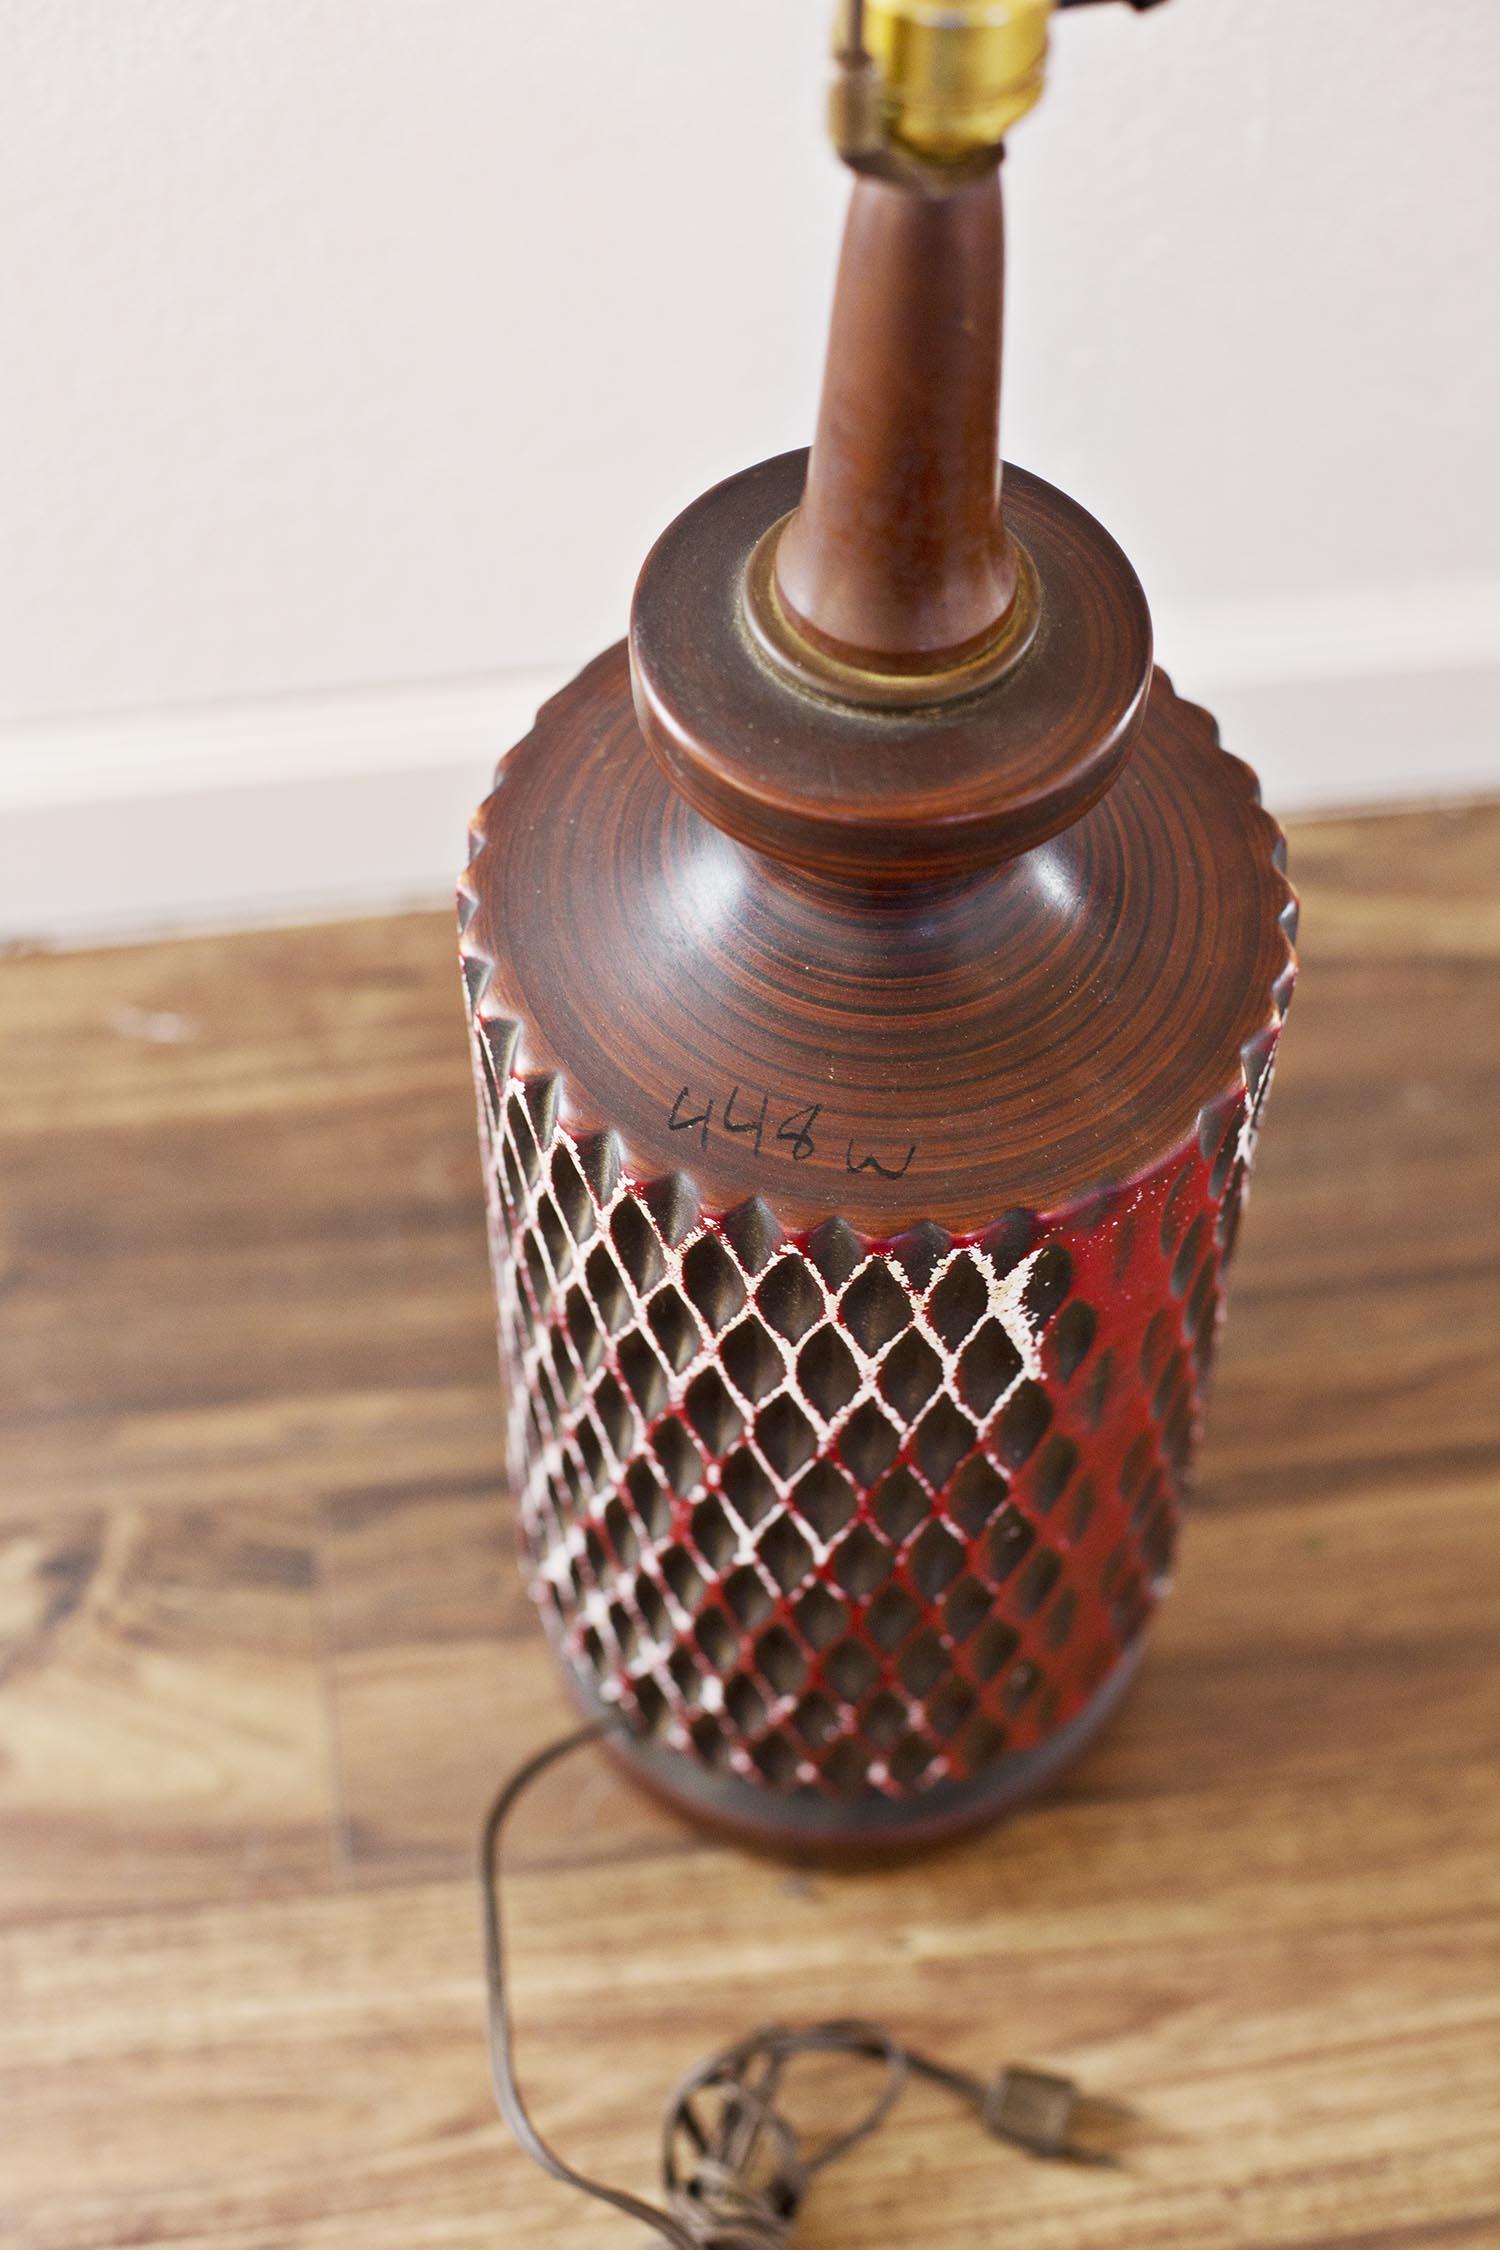 Used lamp